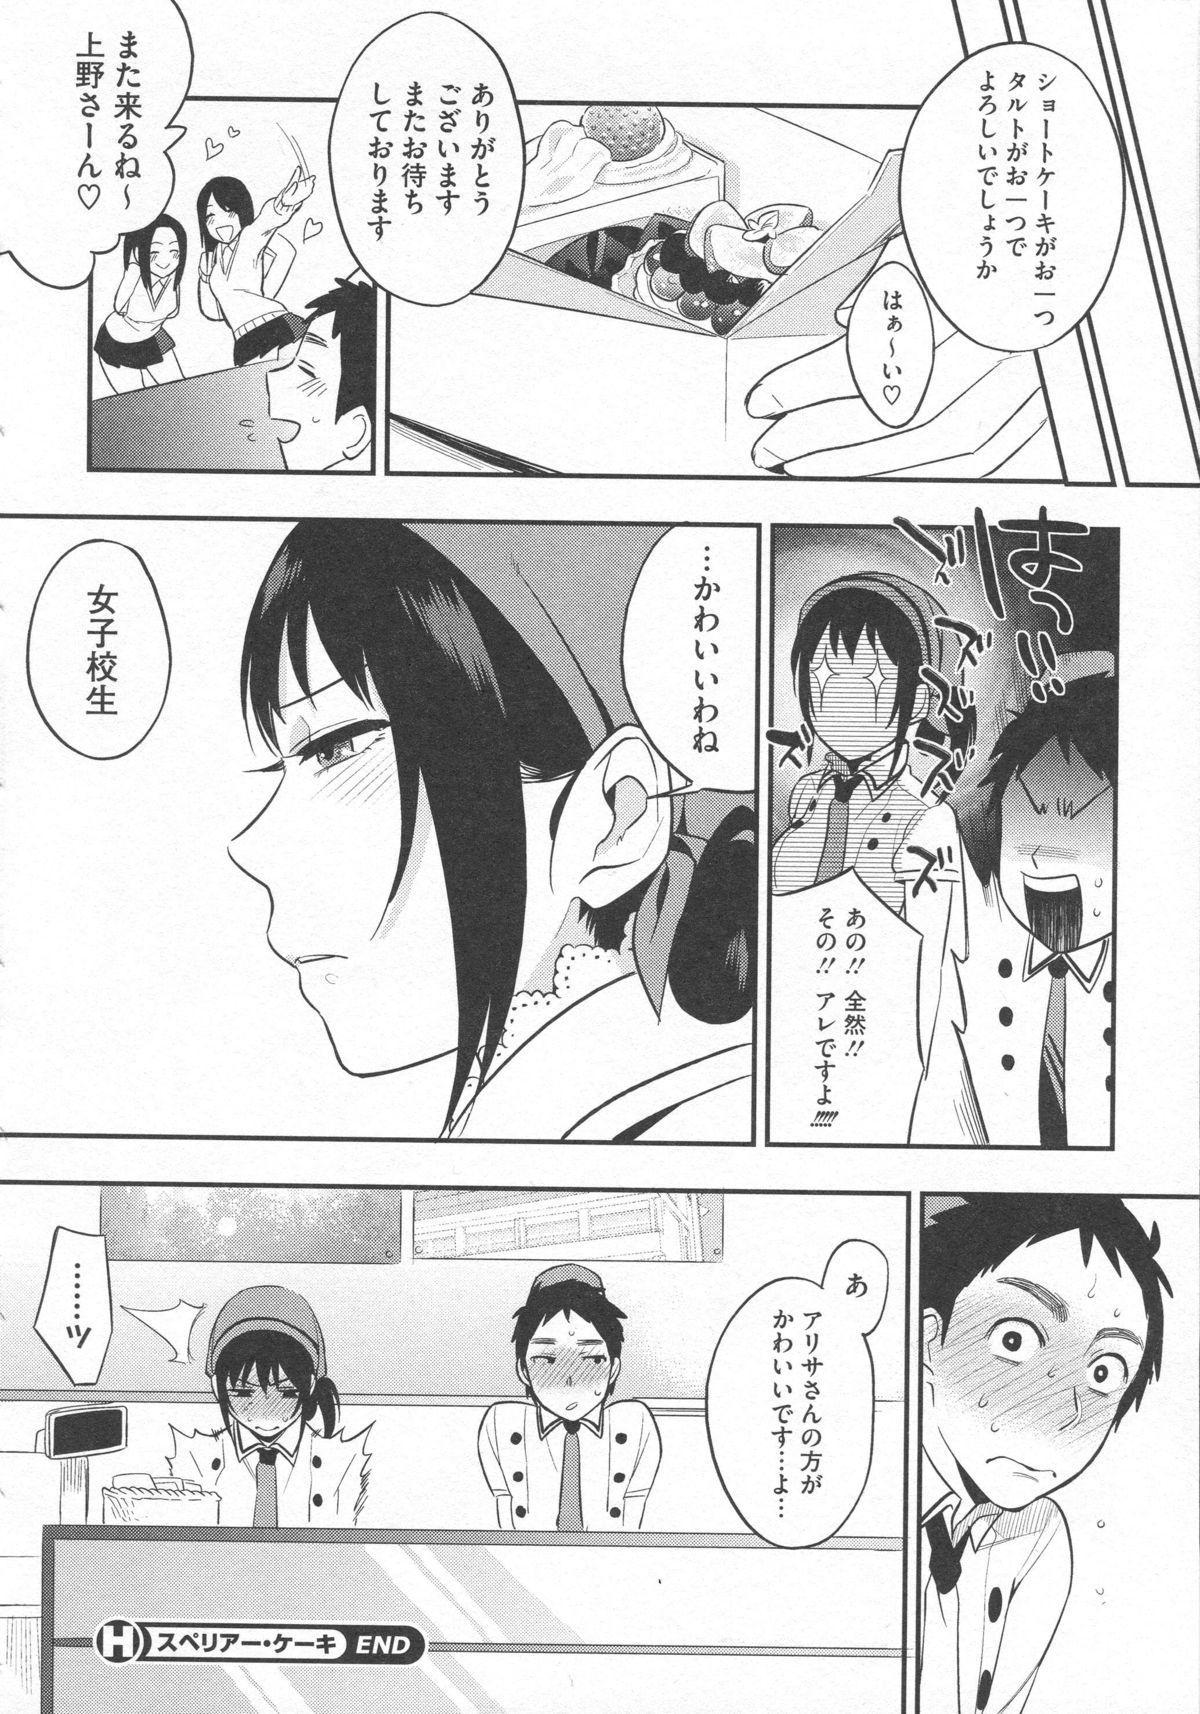 Boku Dake no Yuuyami - Only My Twilight 202